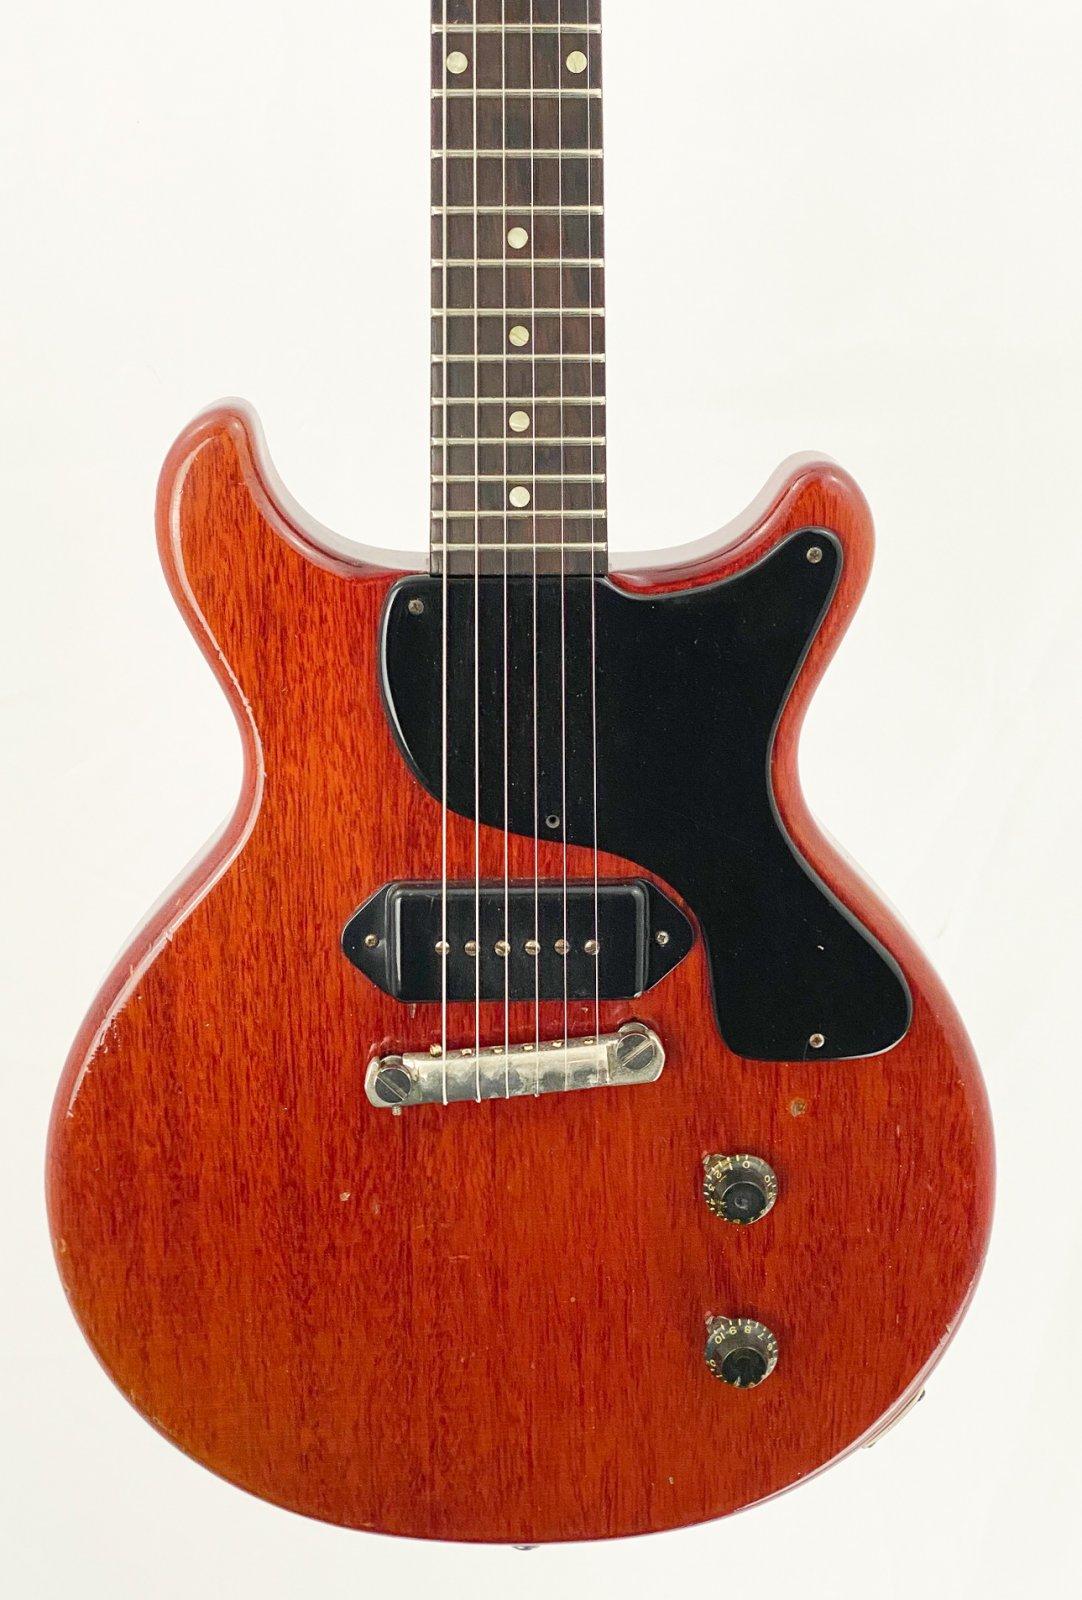 Vintage 1960 Gibson Les Paul Junior - w/original chipboard case